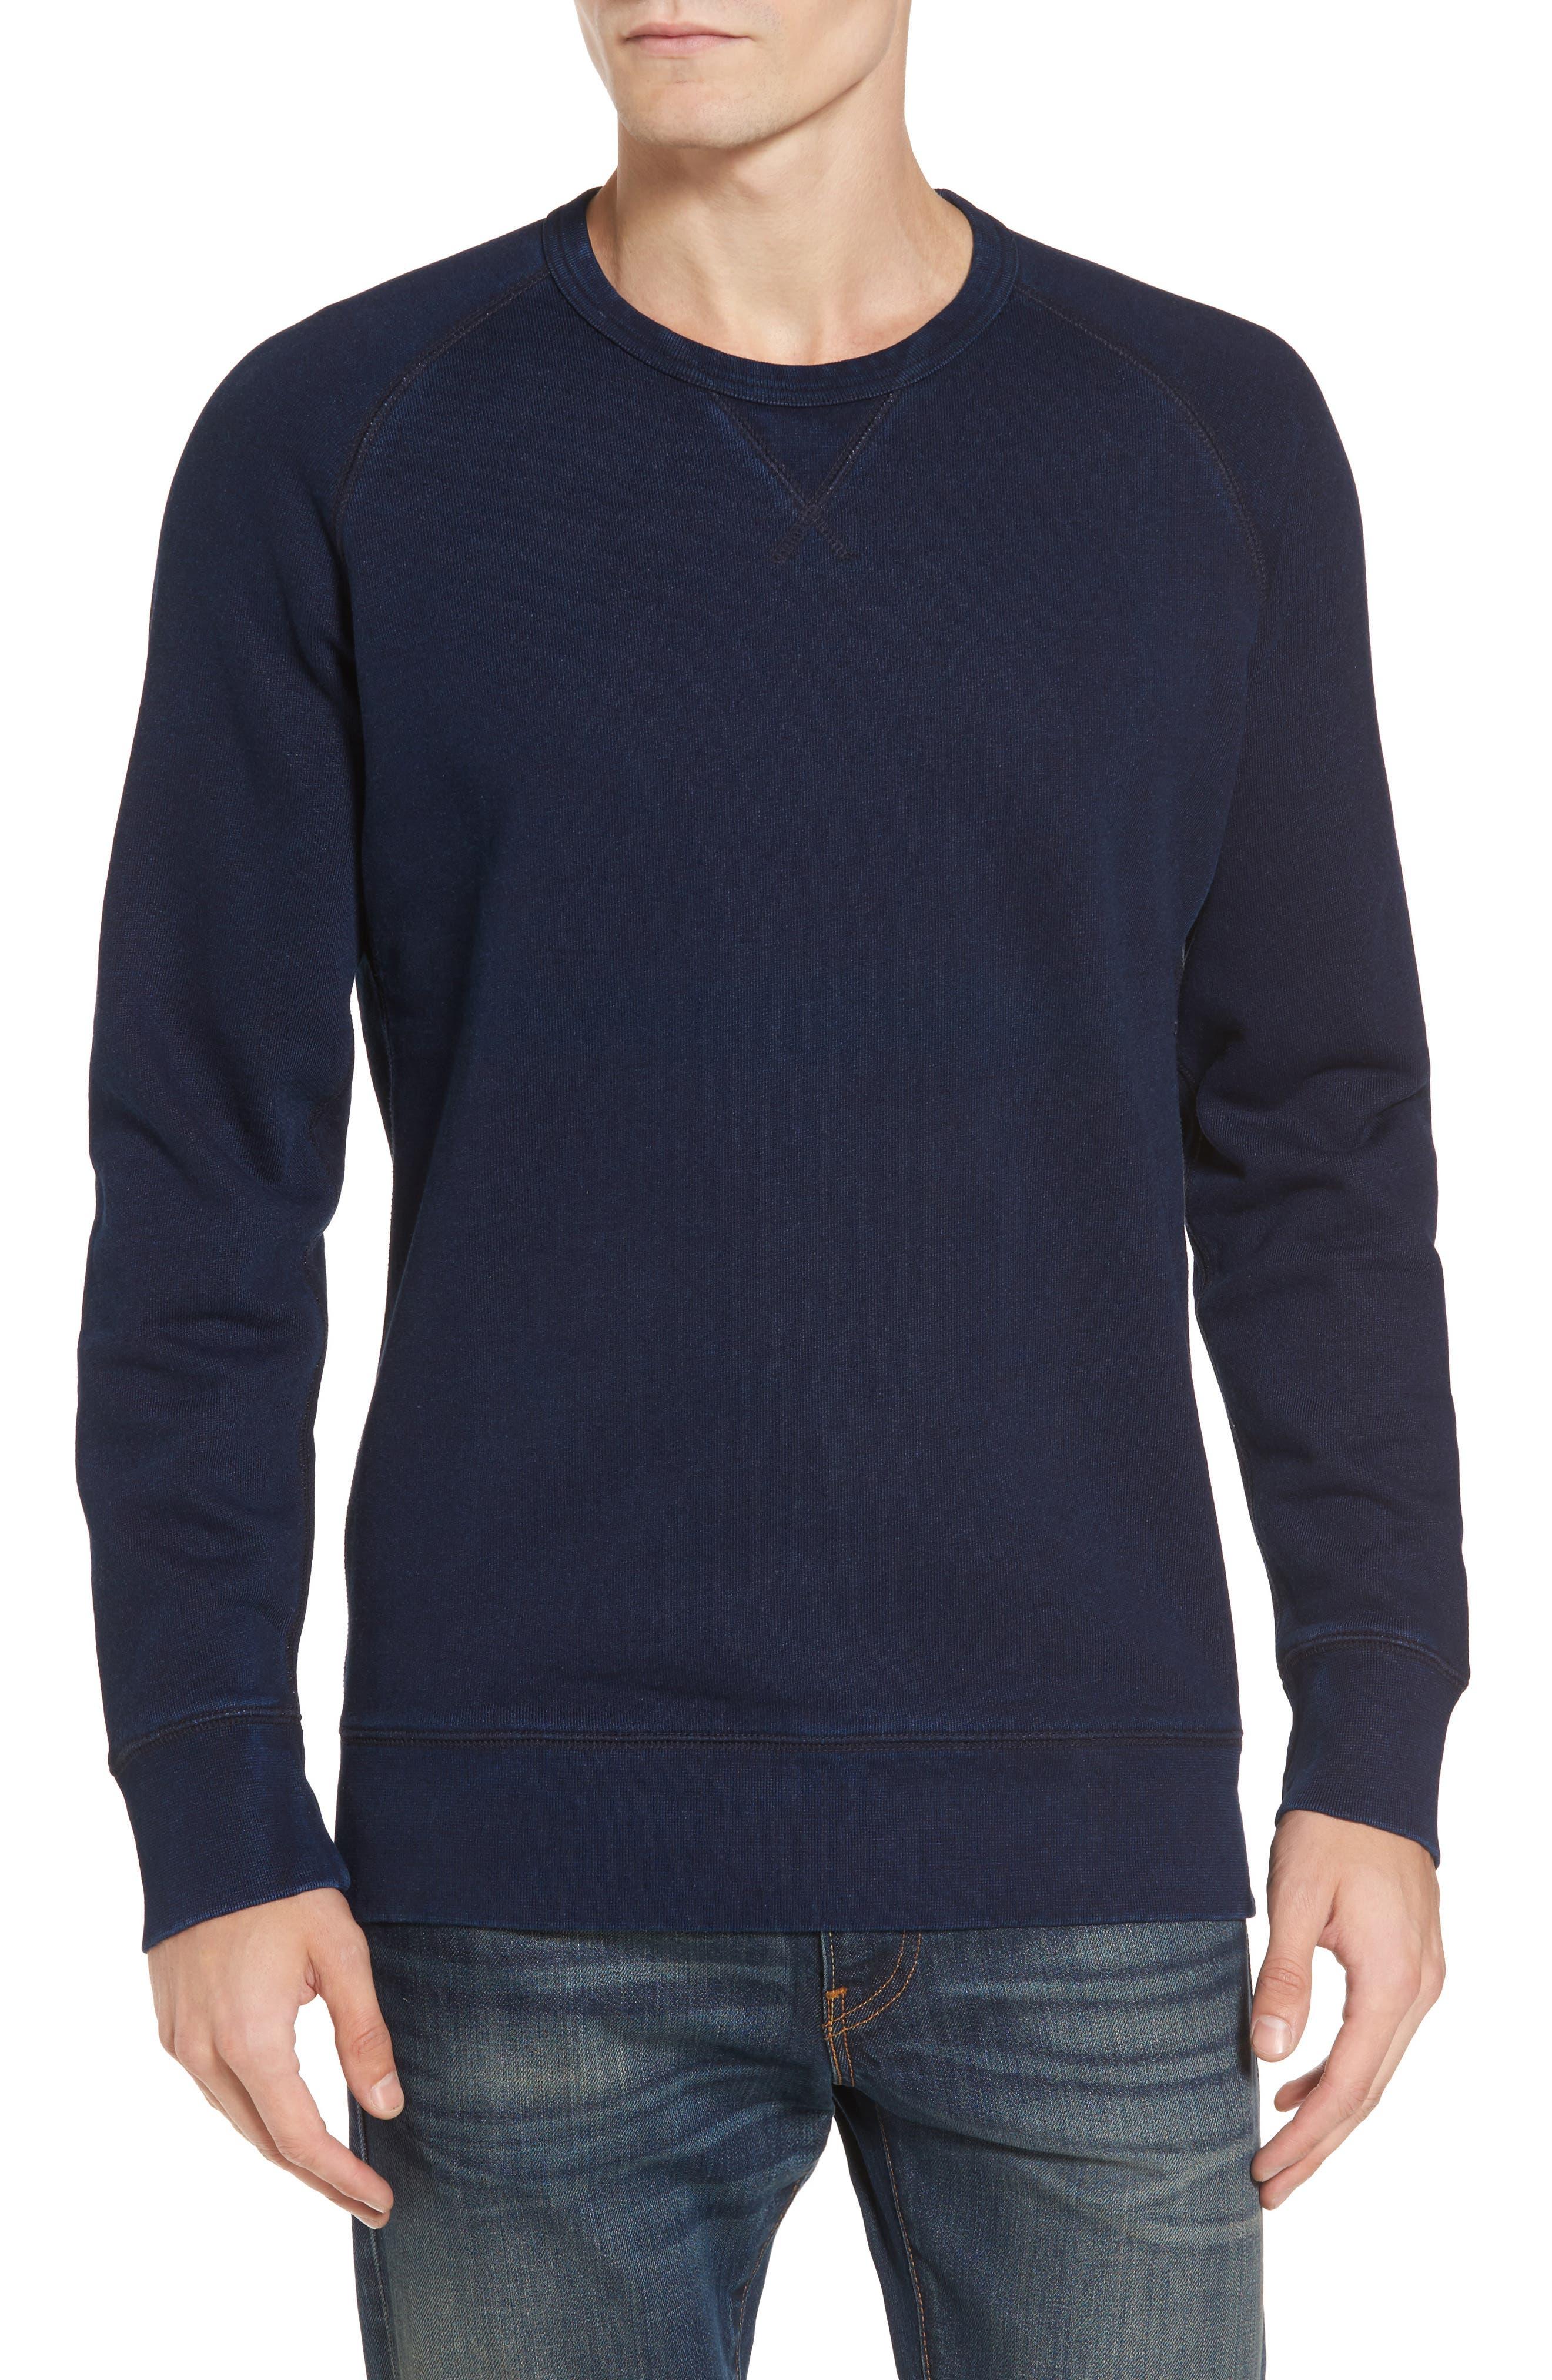 Main Image - Levi's® Original Crewneck Sweater